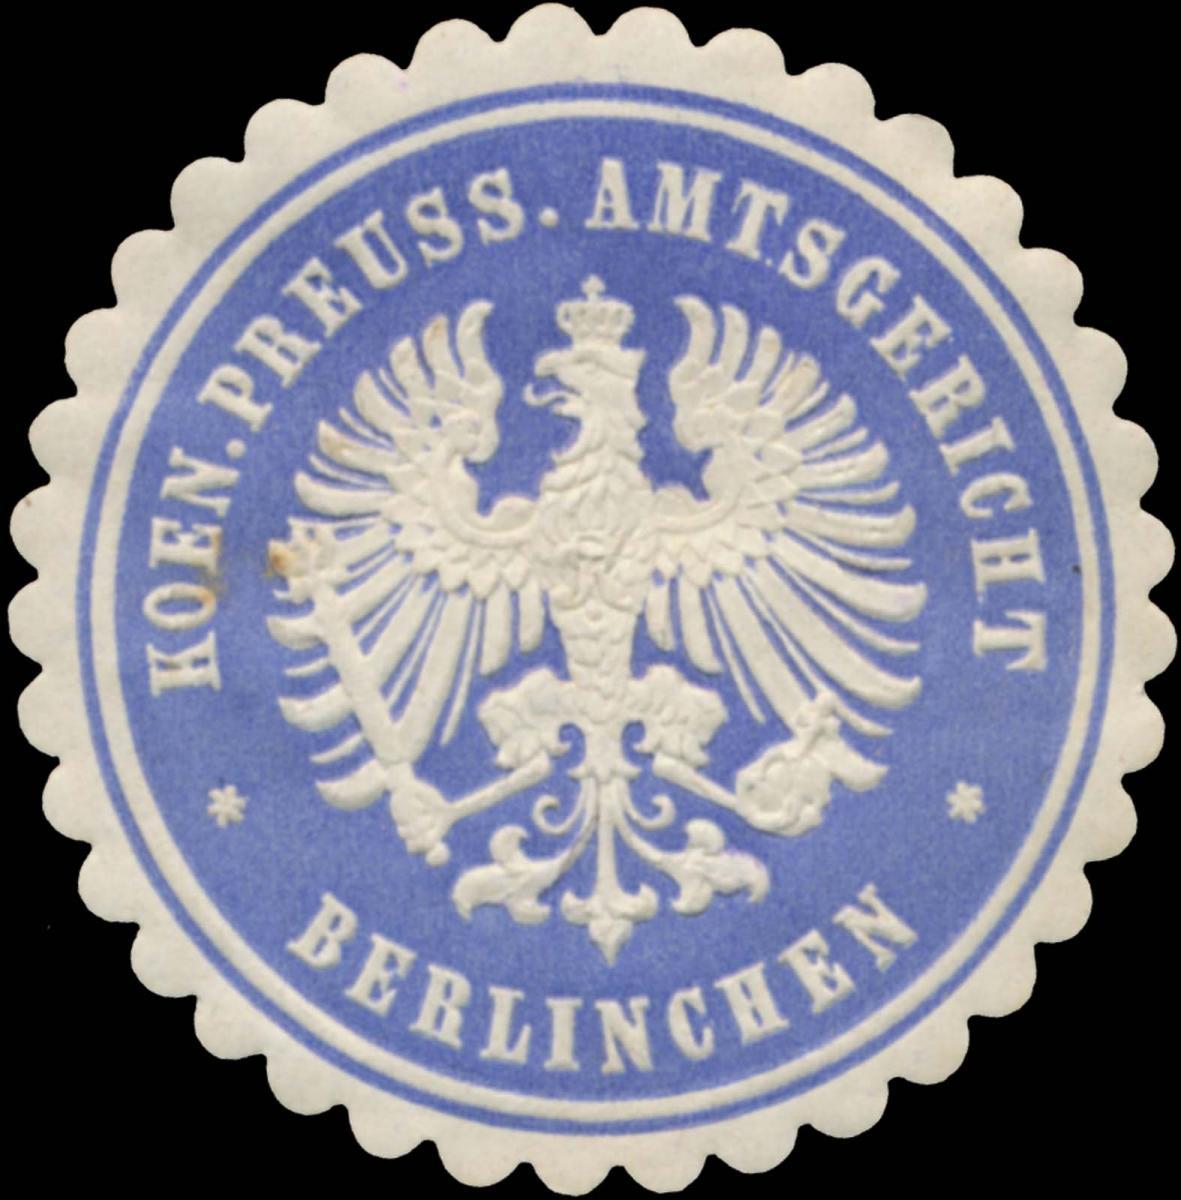 K.Pr. Amtsgericht Berlinchen (Pommern)